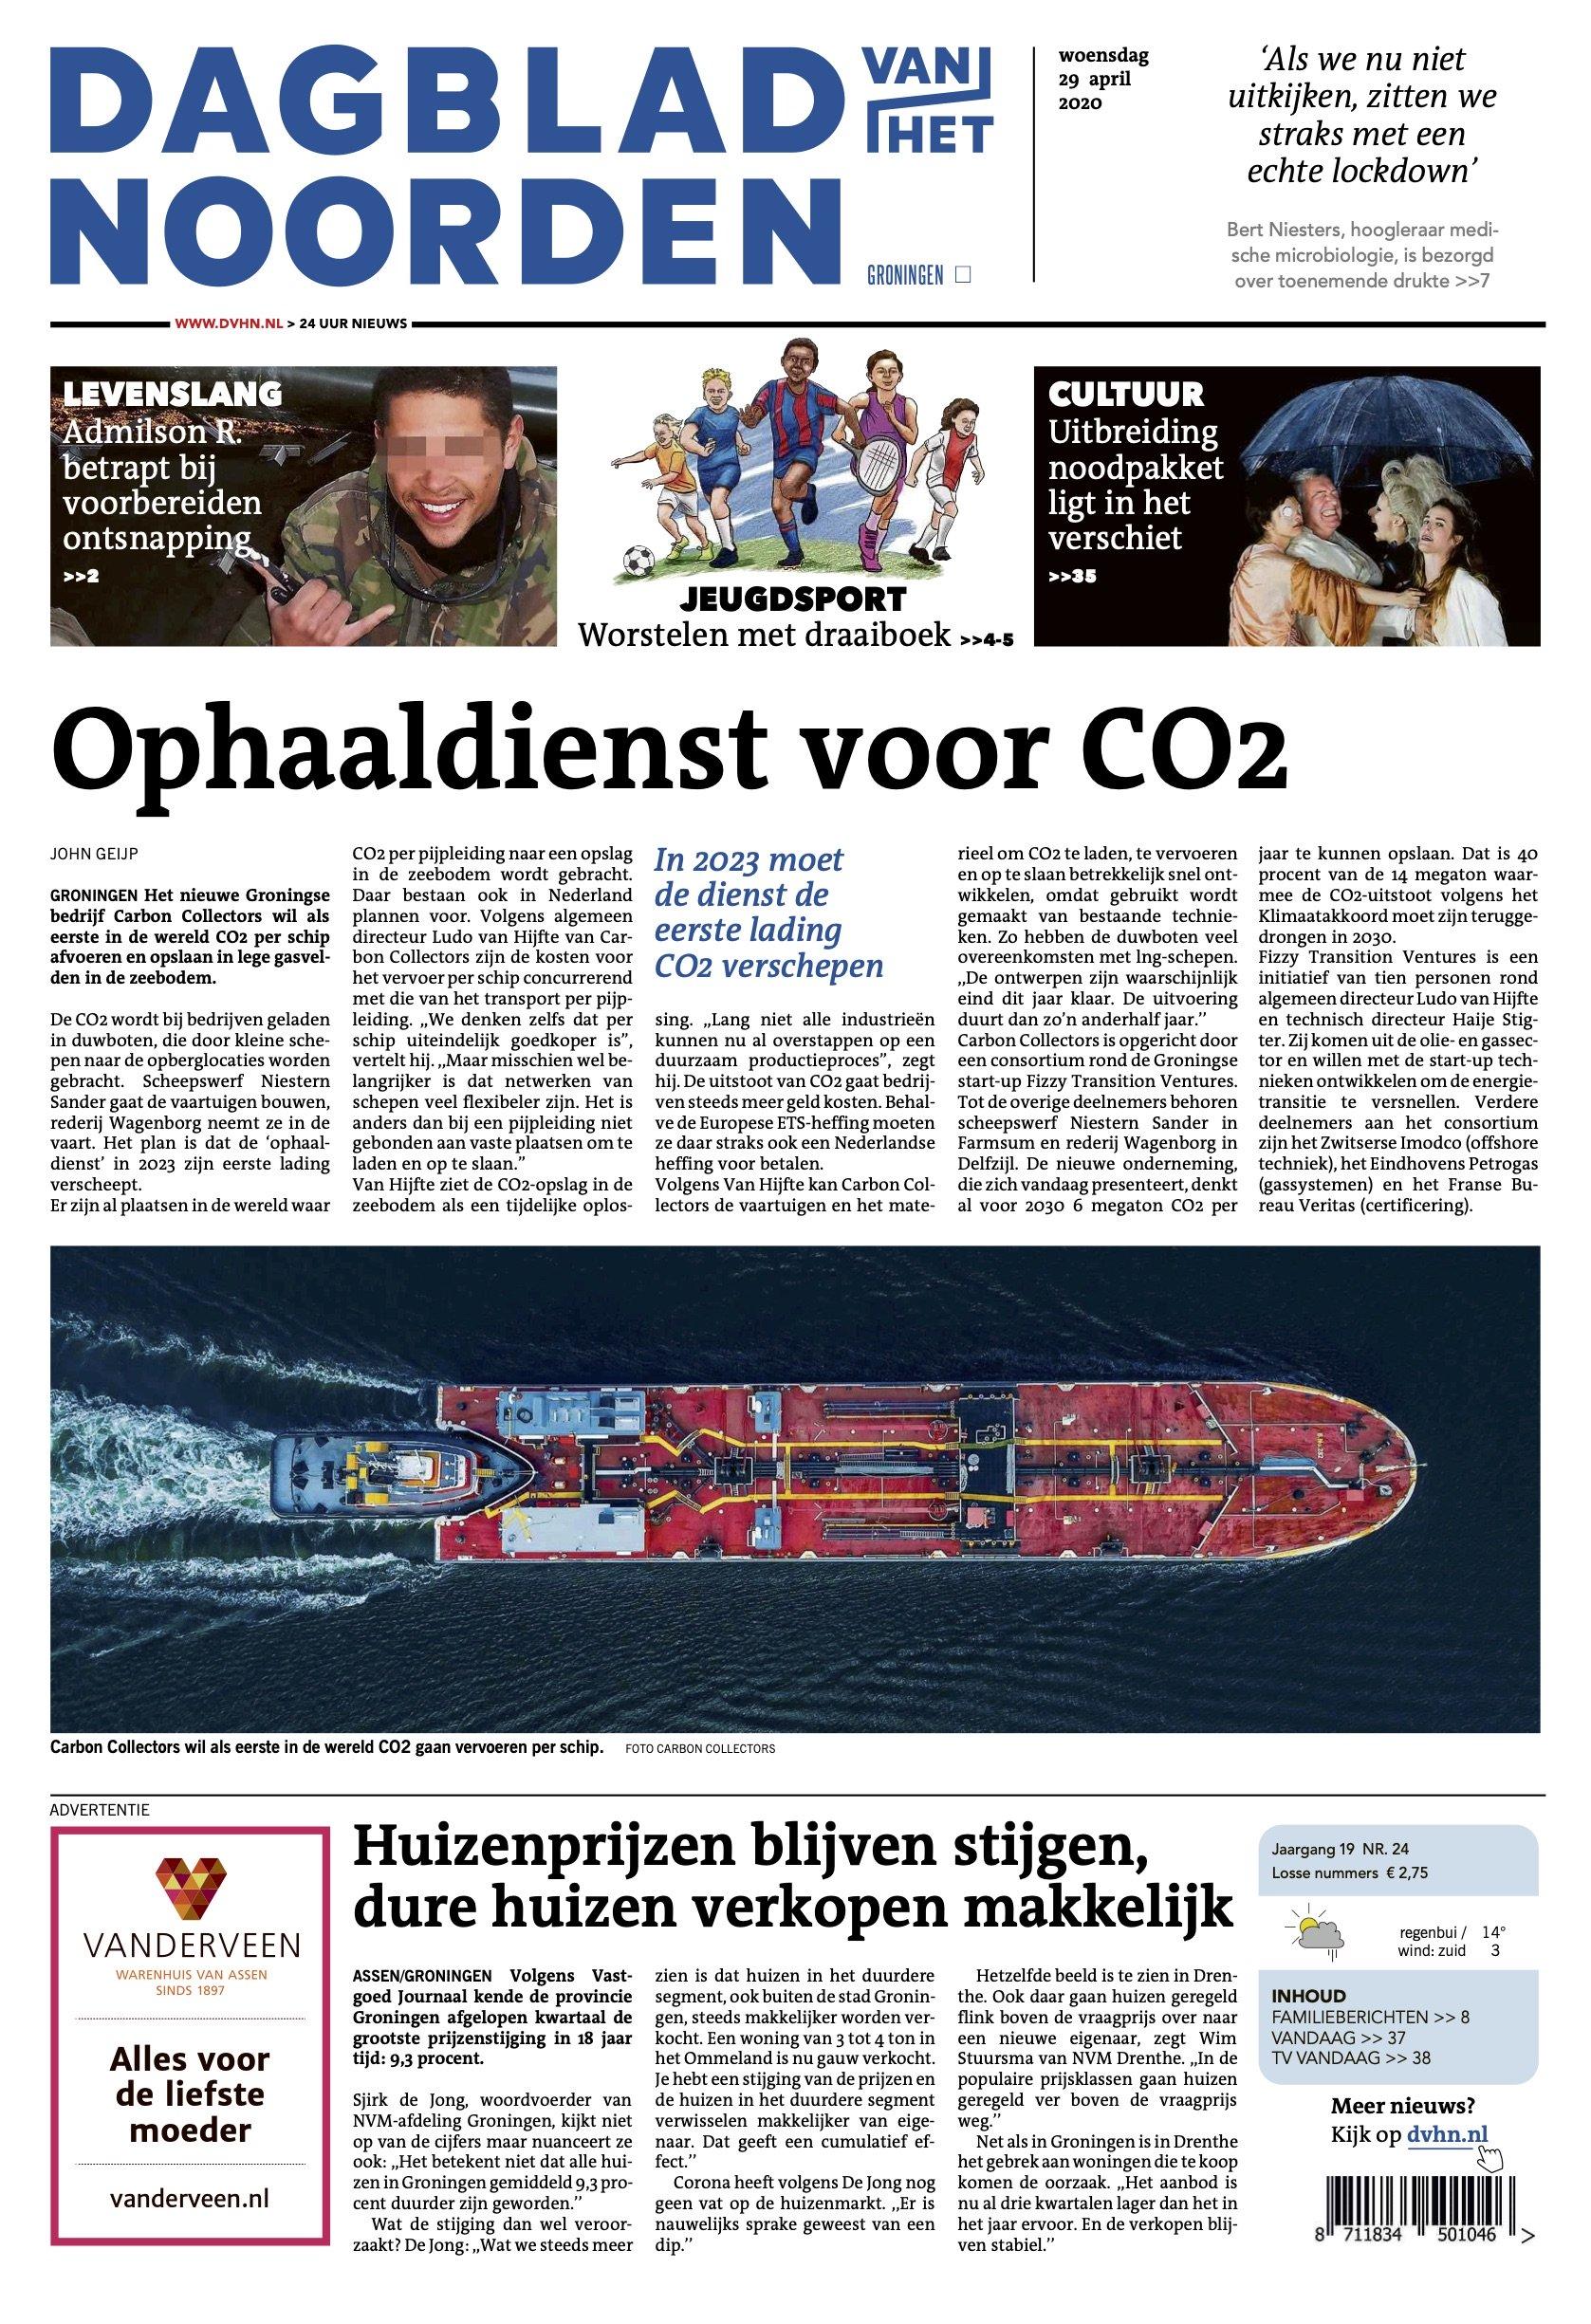 DvhN 2020-04-29_Groningen Carbon Collectors